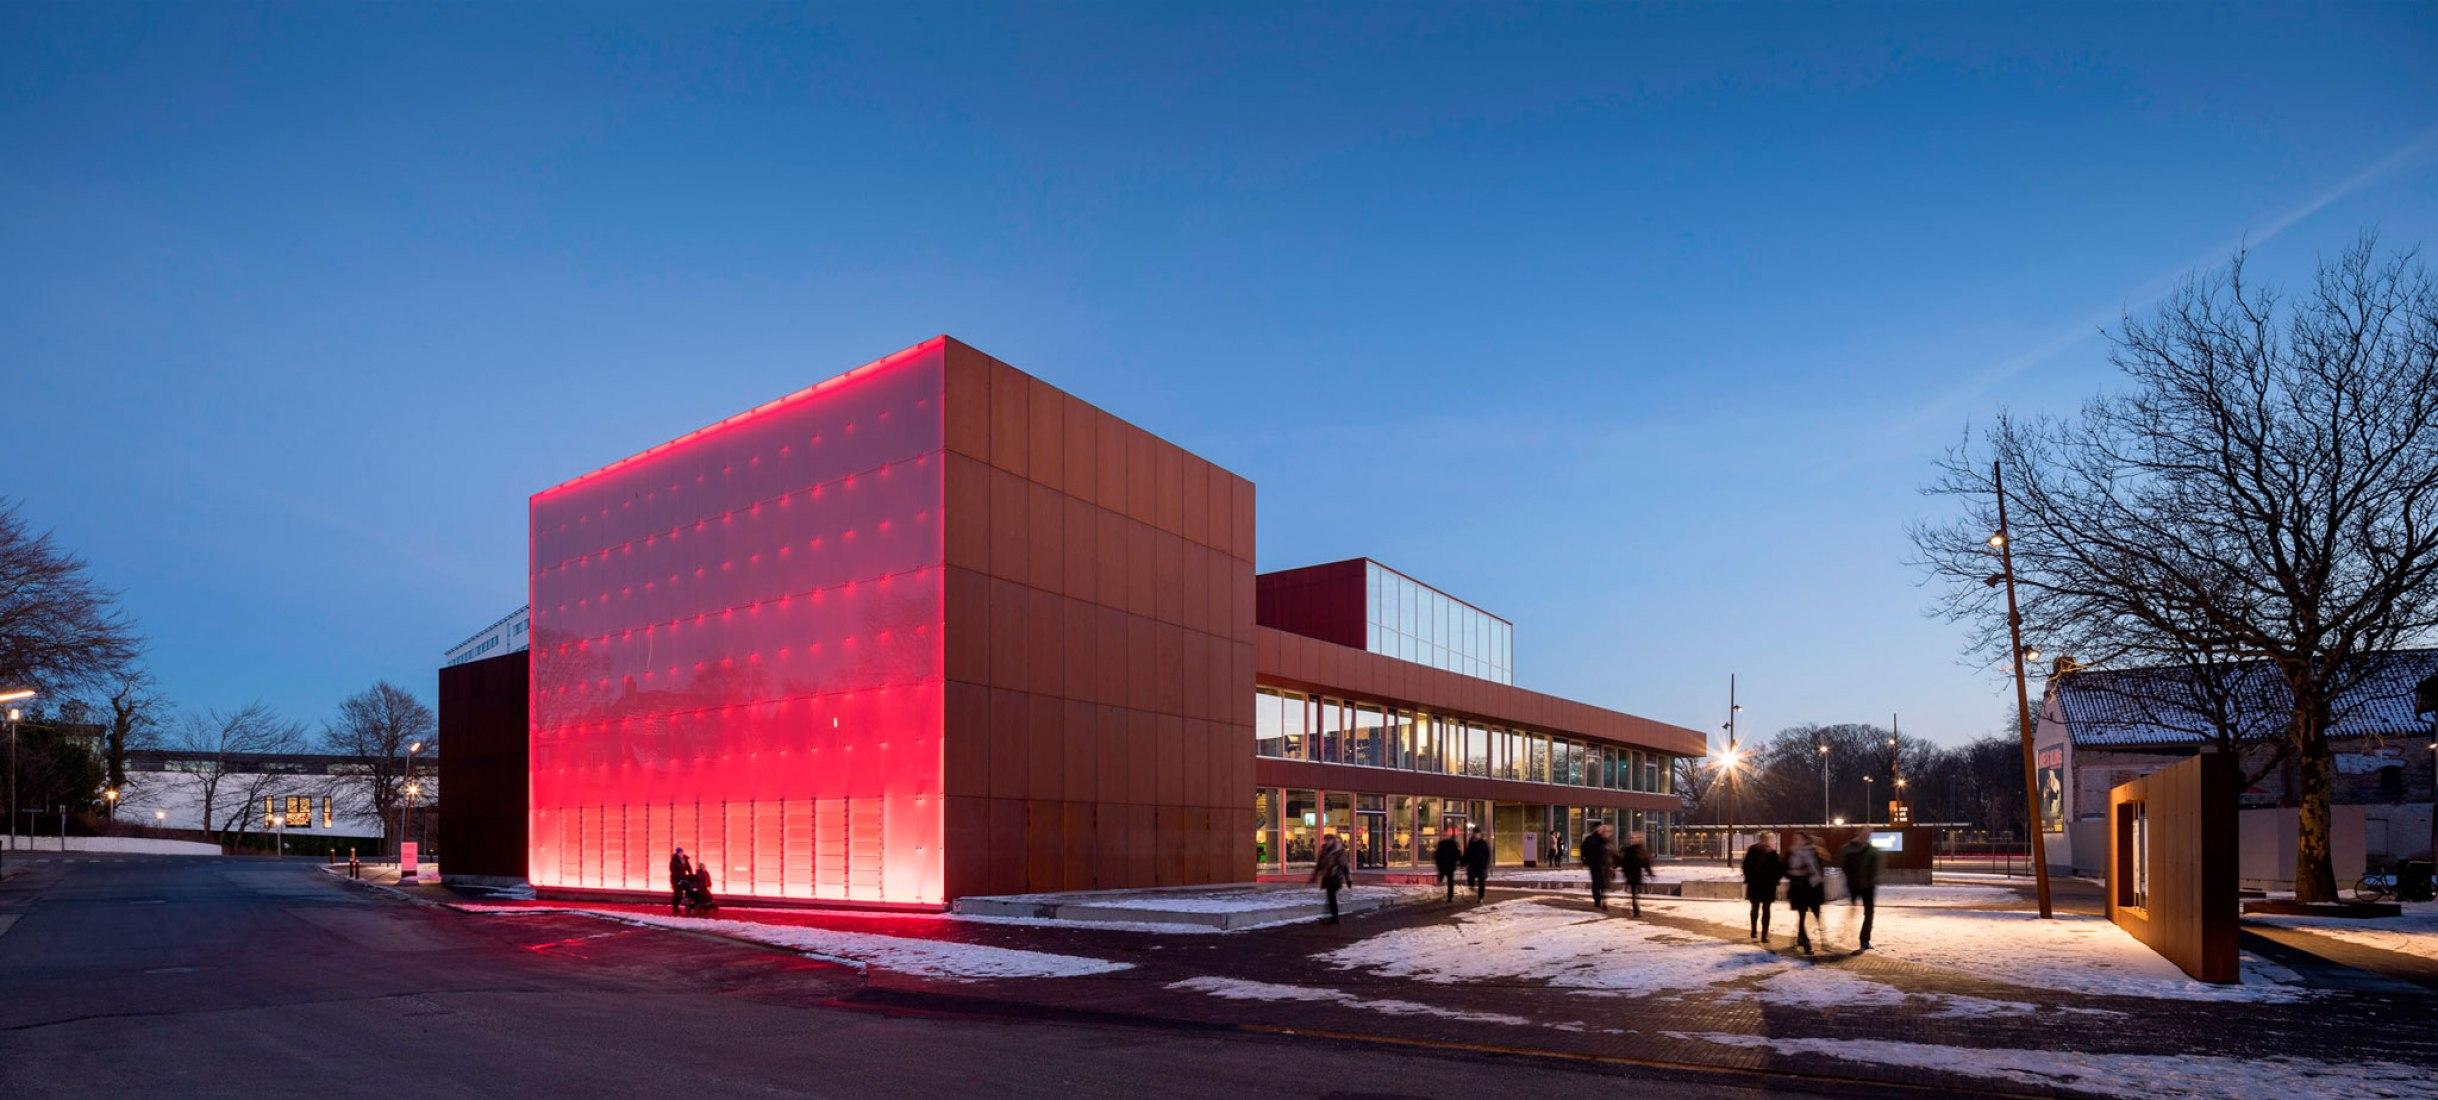 Iluminación nocturna. Teatro Vendsyssel por Schmidt Hammer Lassen Architects. Fotografía @ Adam Mørk